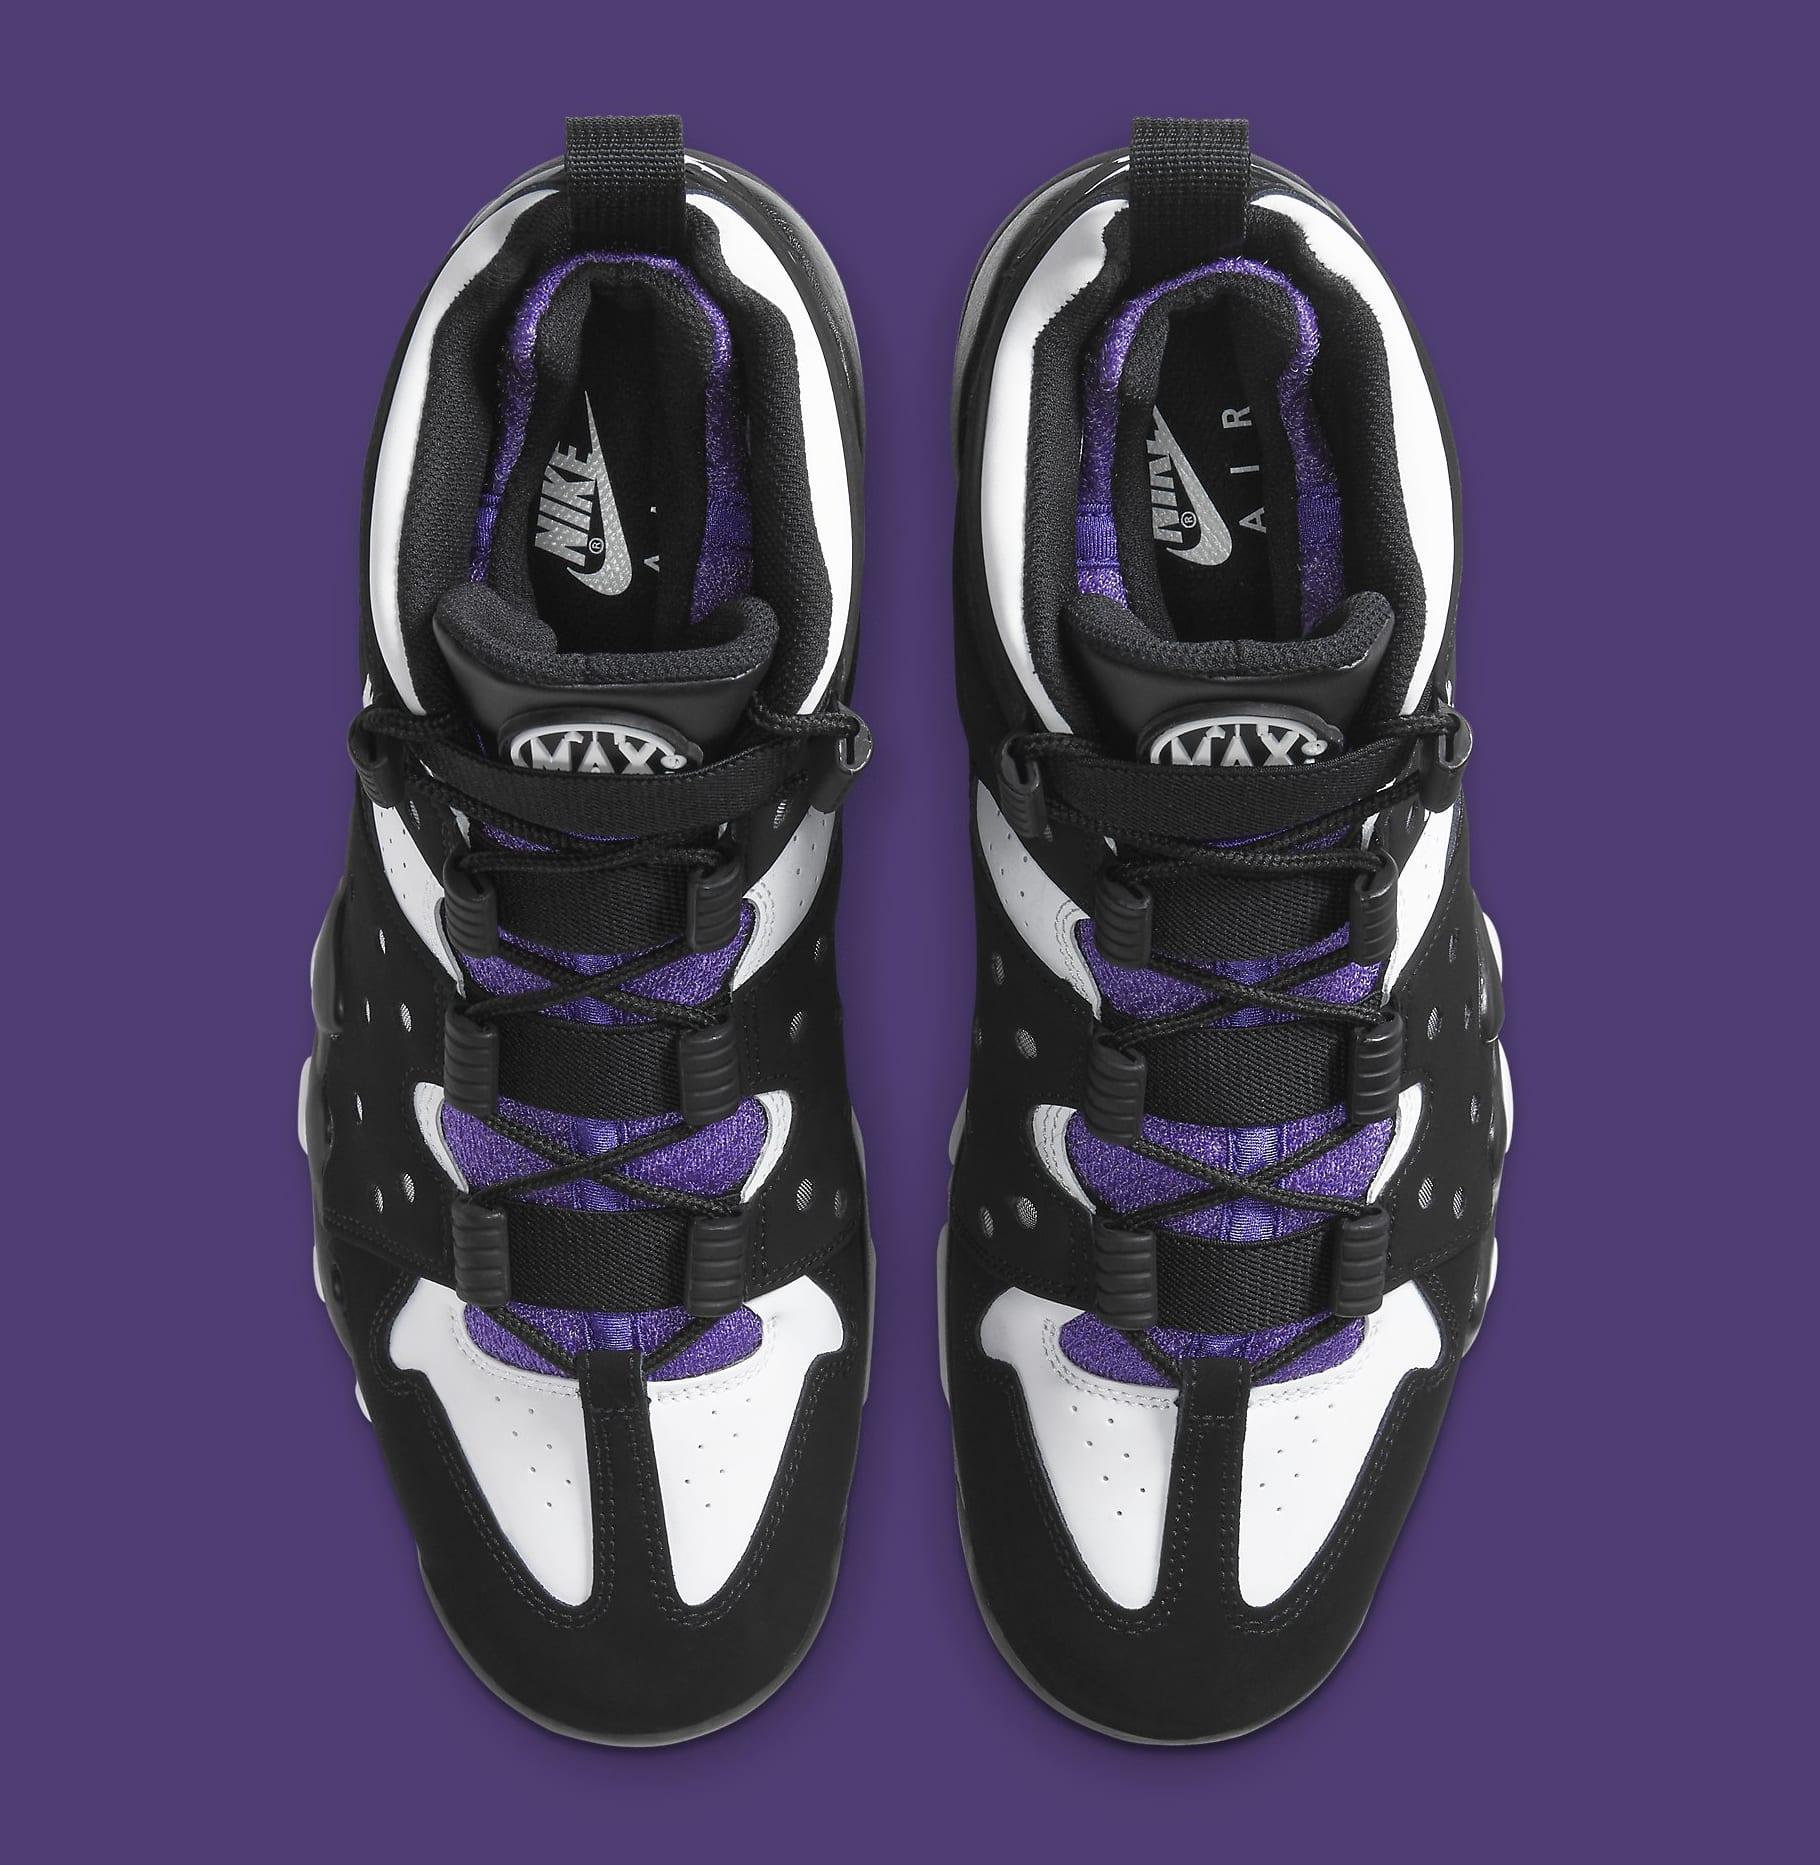 Nike Air Max CB 94 'Varsity Purple' CZ7871-001 Top